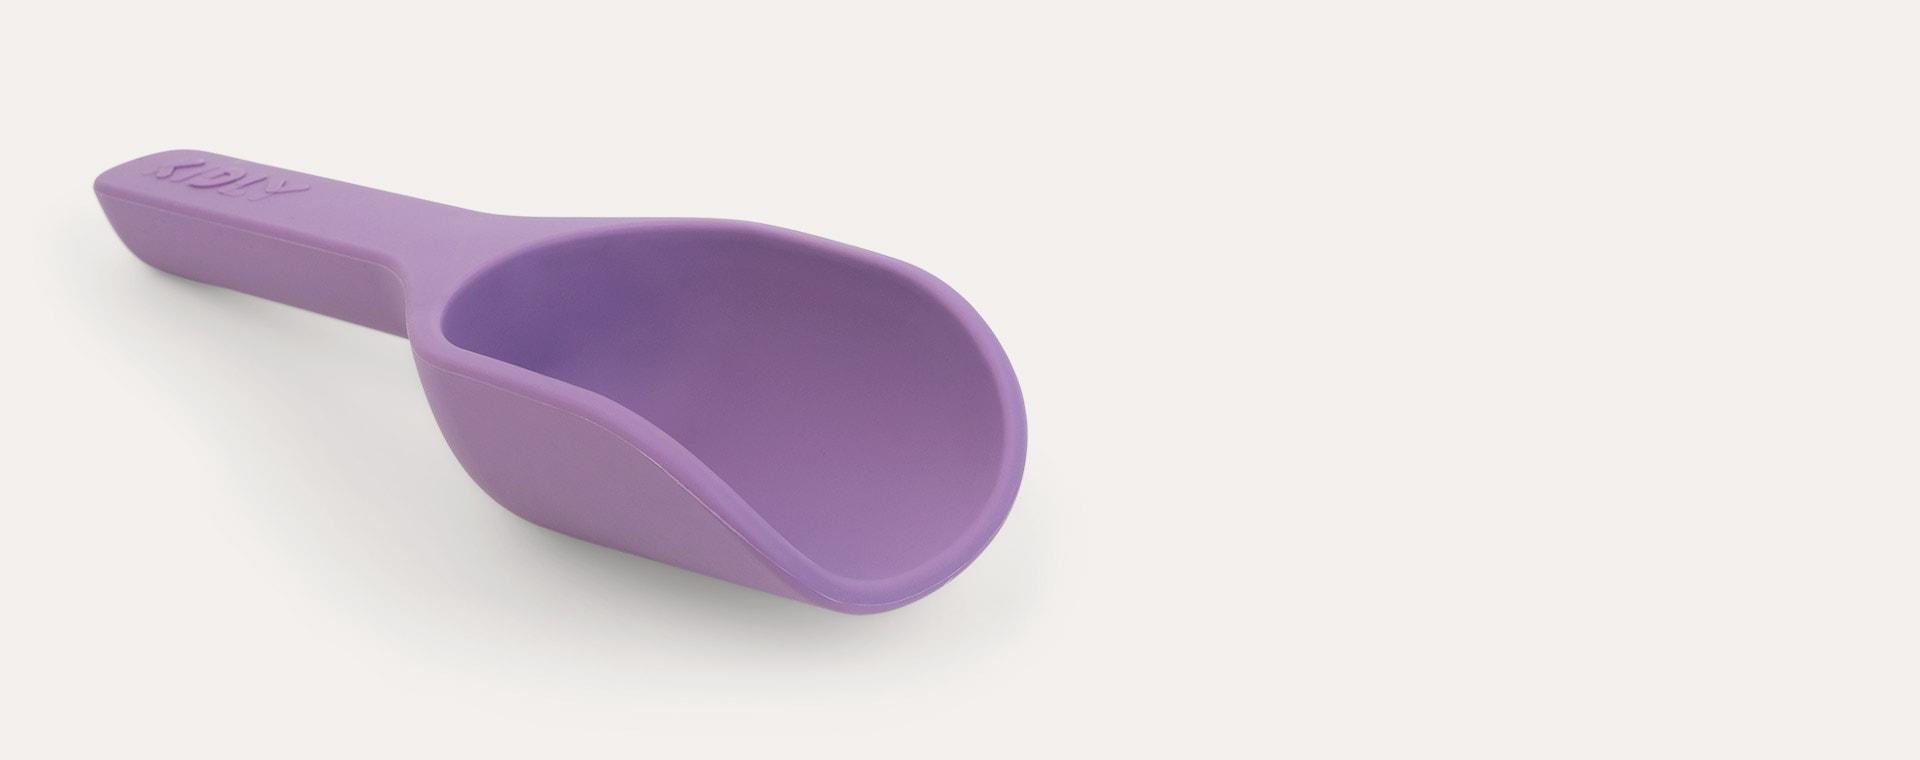 Orchid KIDLY Label Foldaway Bucket & Spade Set